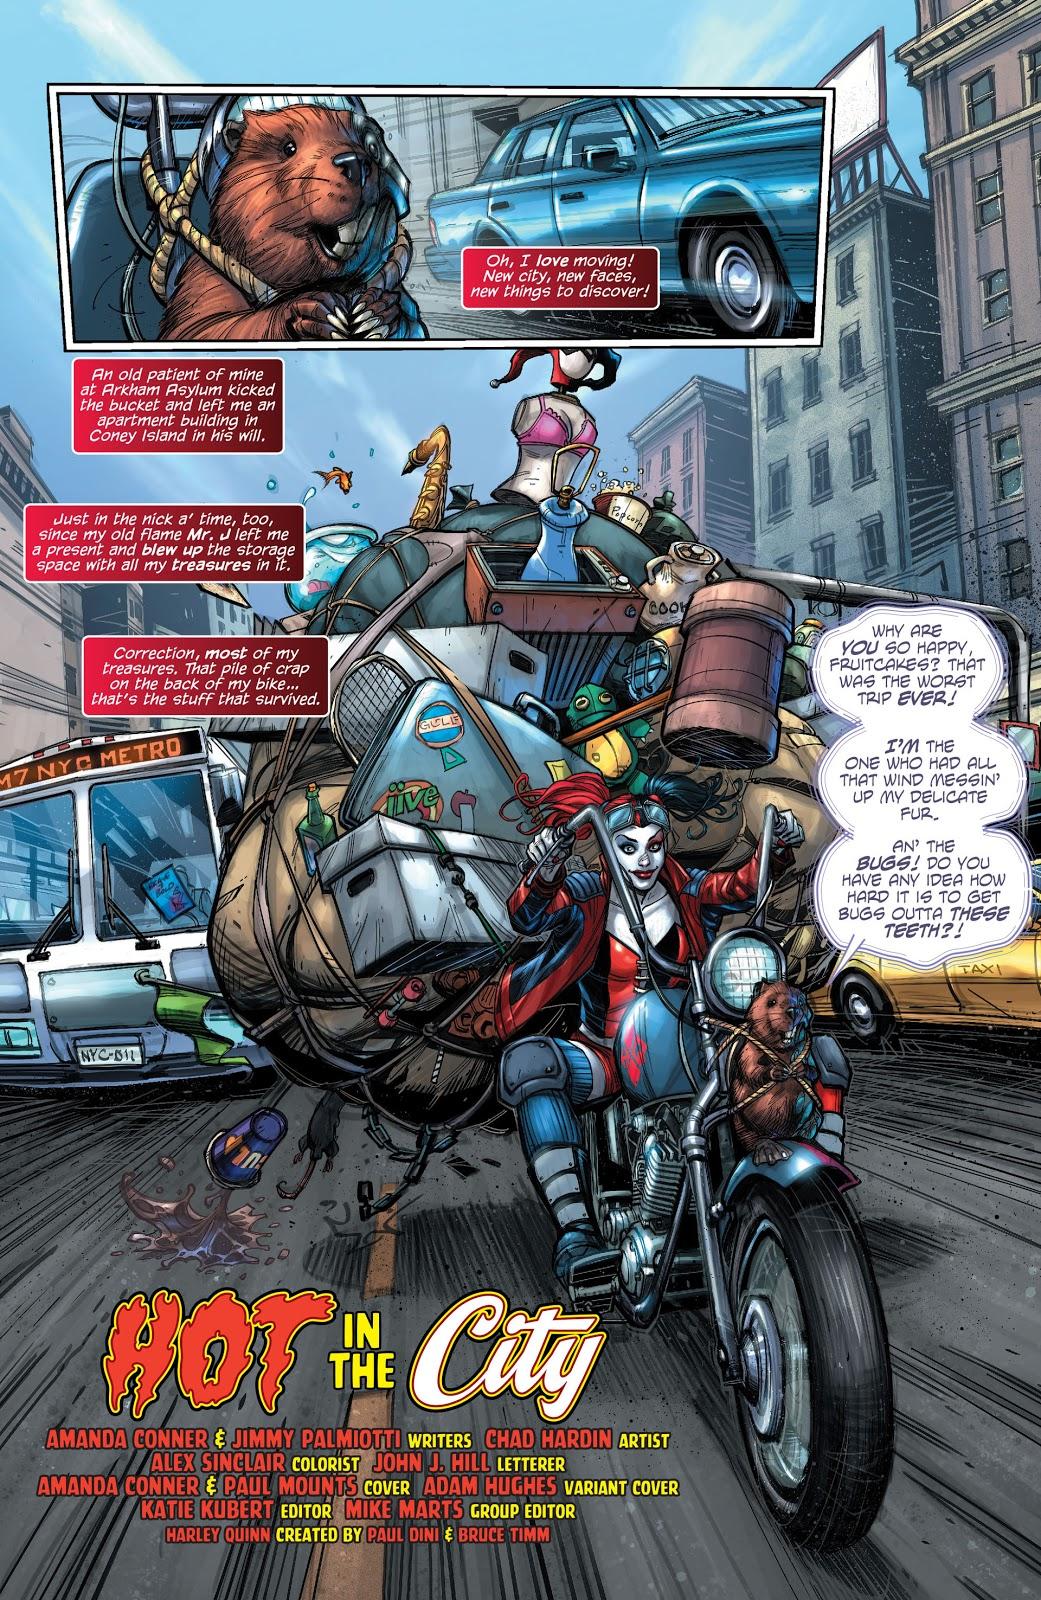 Harley Quinn Vol. 2 #1